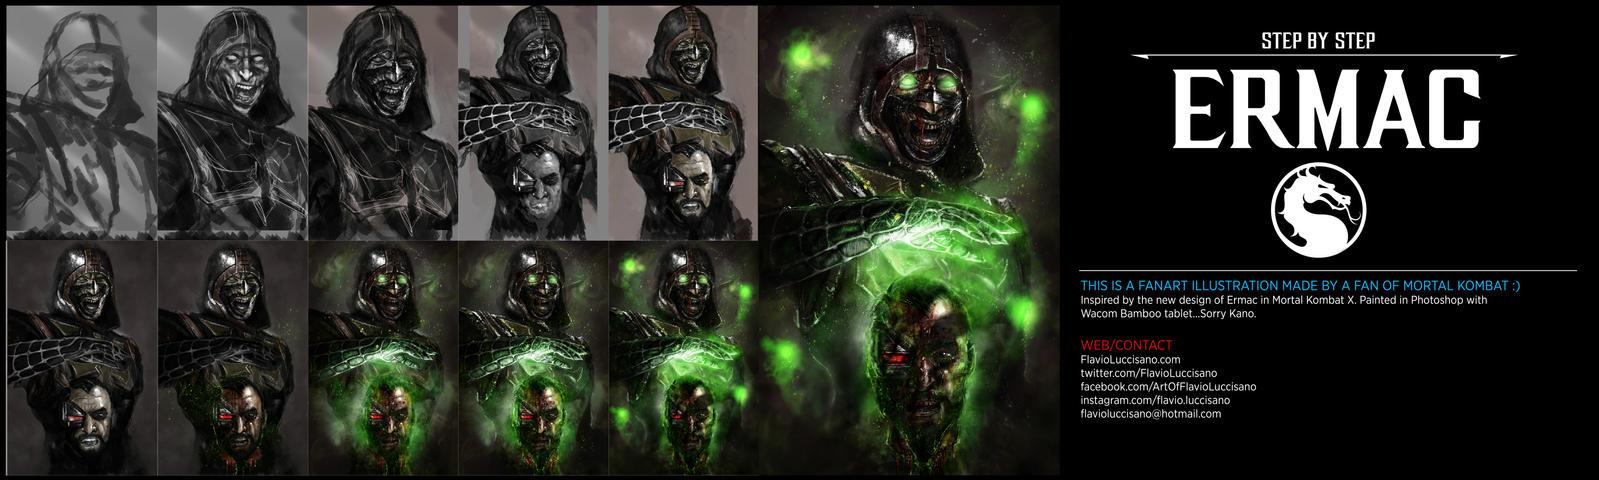 Ermac (Mortal Kombat X) STEP BY STEP by flavioluccisano